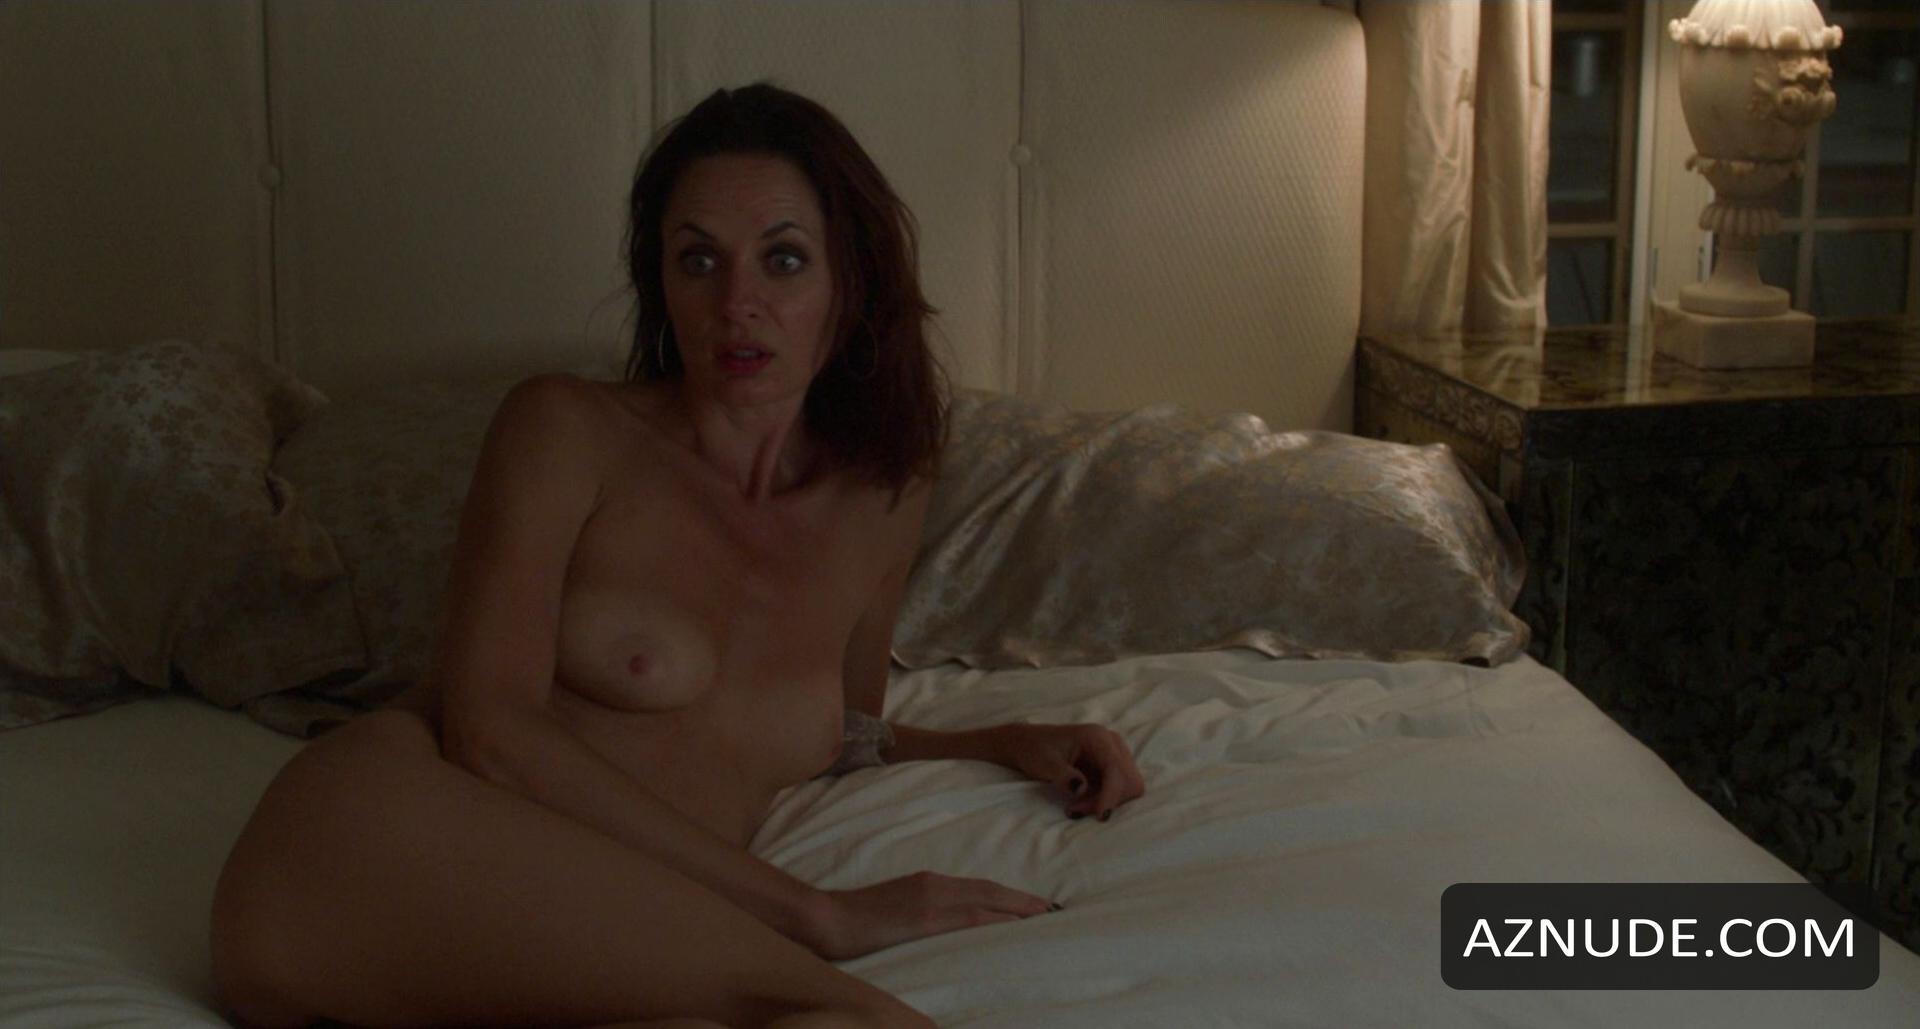 nude videos of stars